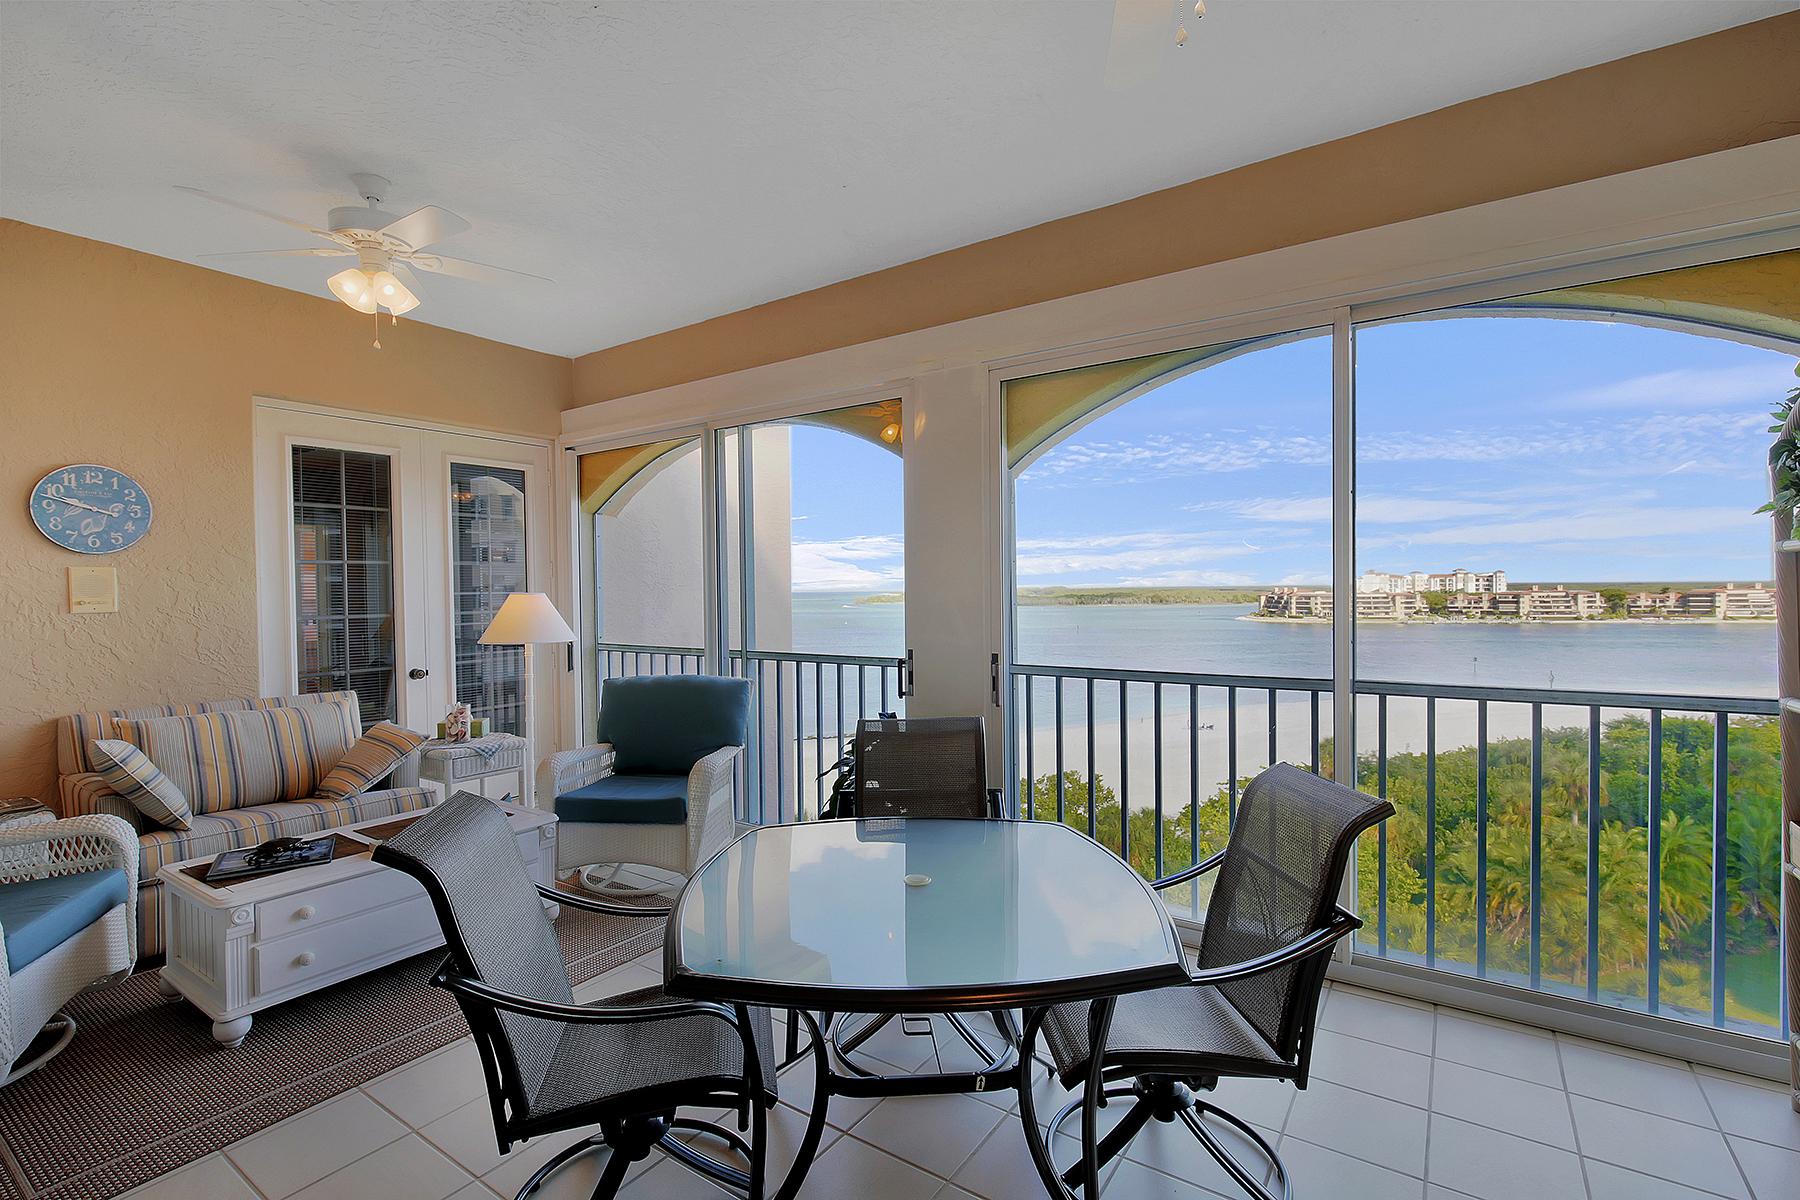 Condomínio para Venda às HIDEAWAY BEACH 3000 Royal Marco Way PH-S Marco Island, Florida 34145 Estados Unidos